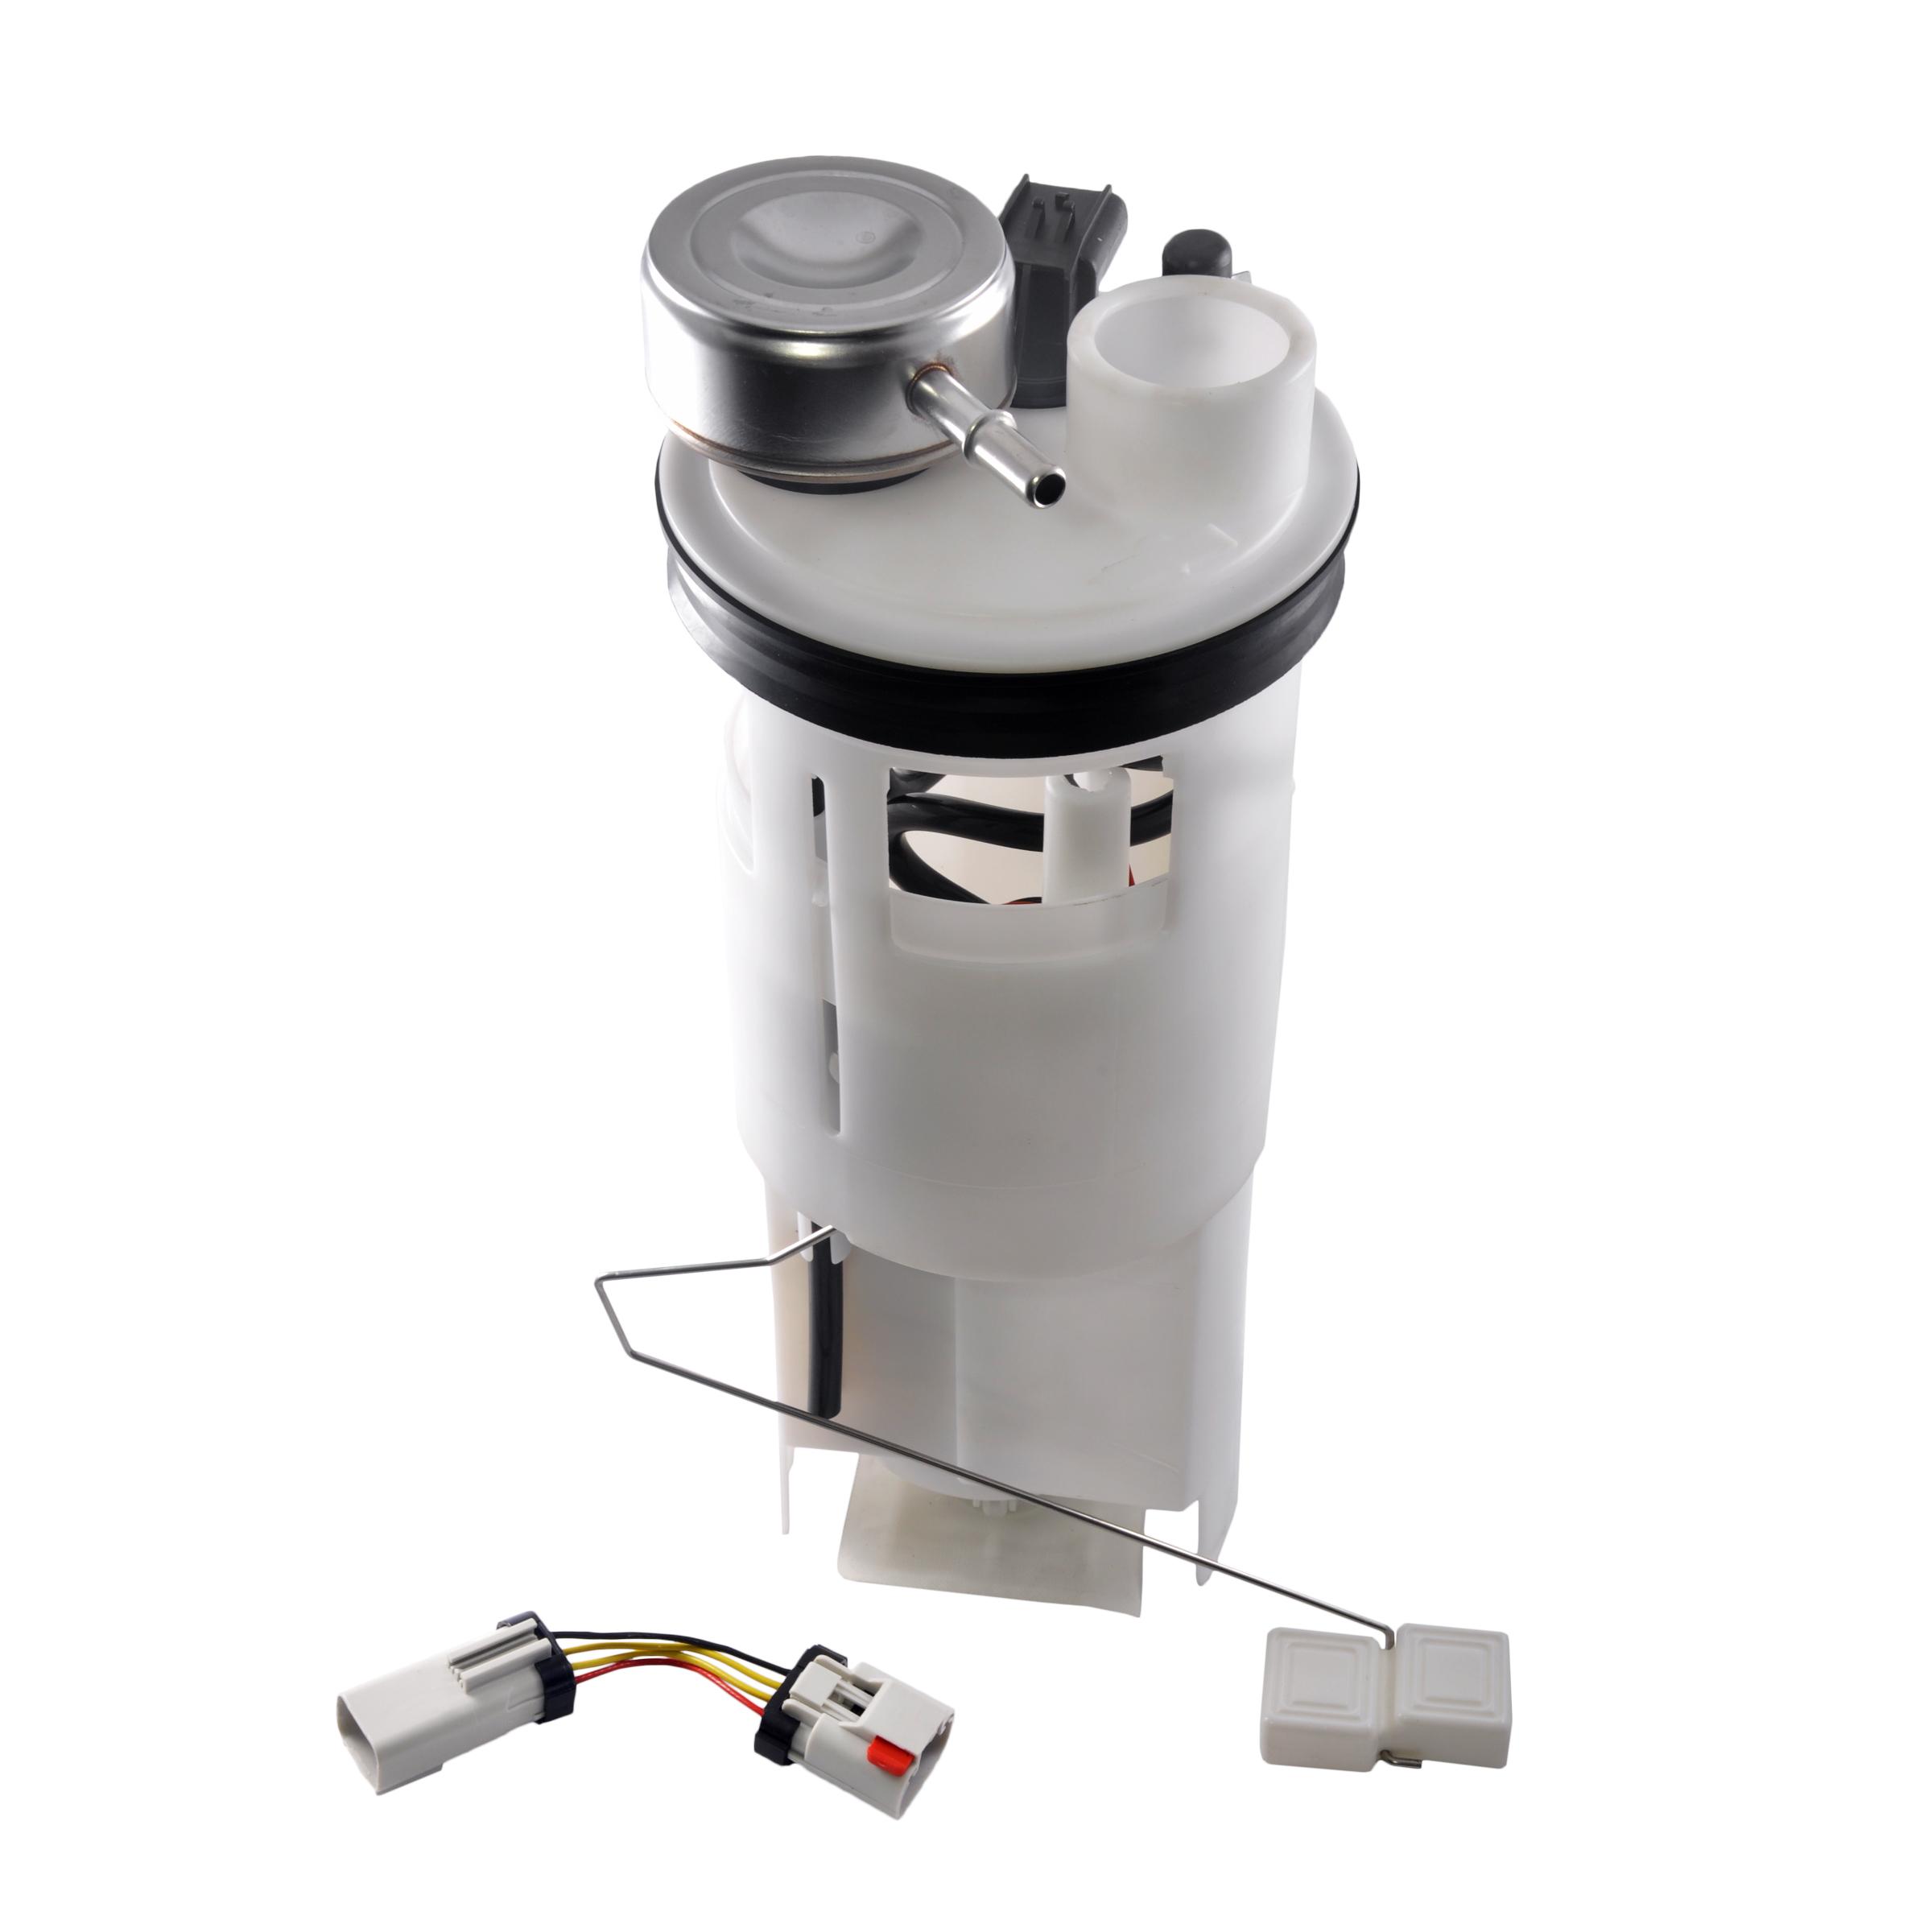 Dodge Fuel Pump: New Premium High Performance Fuel Pump Module 185GE For